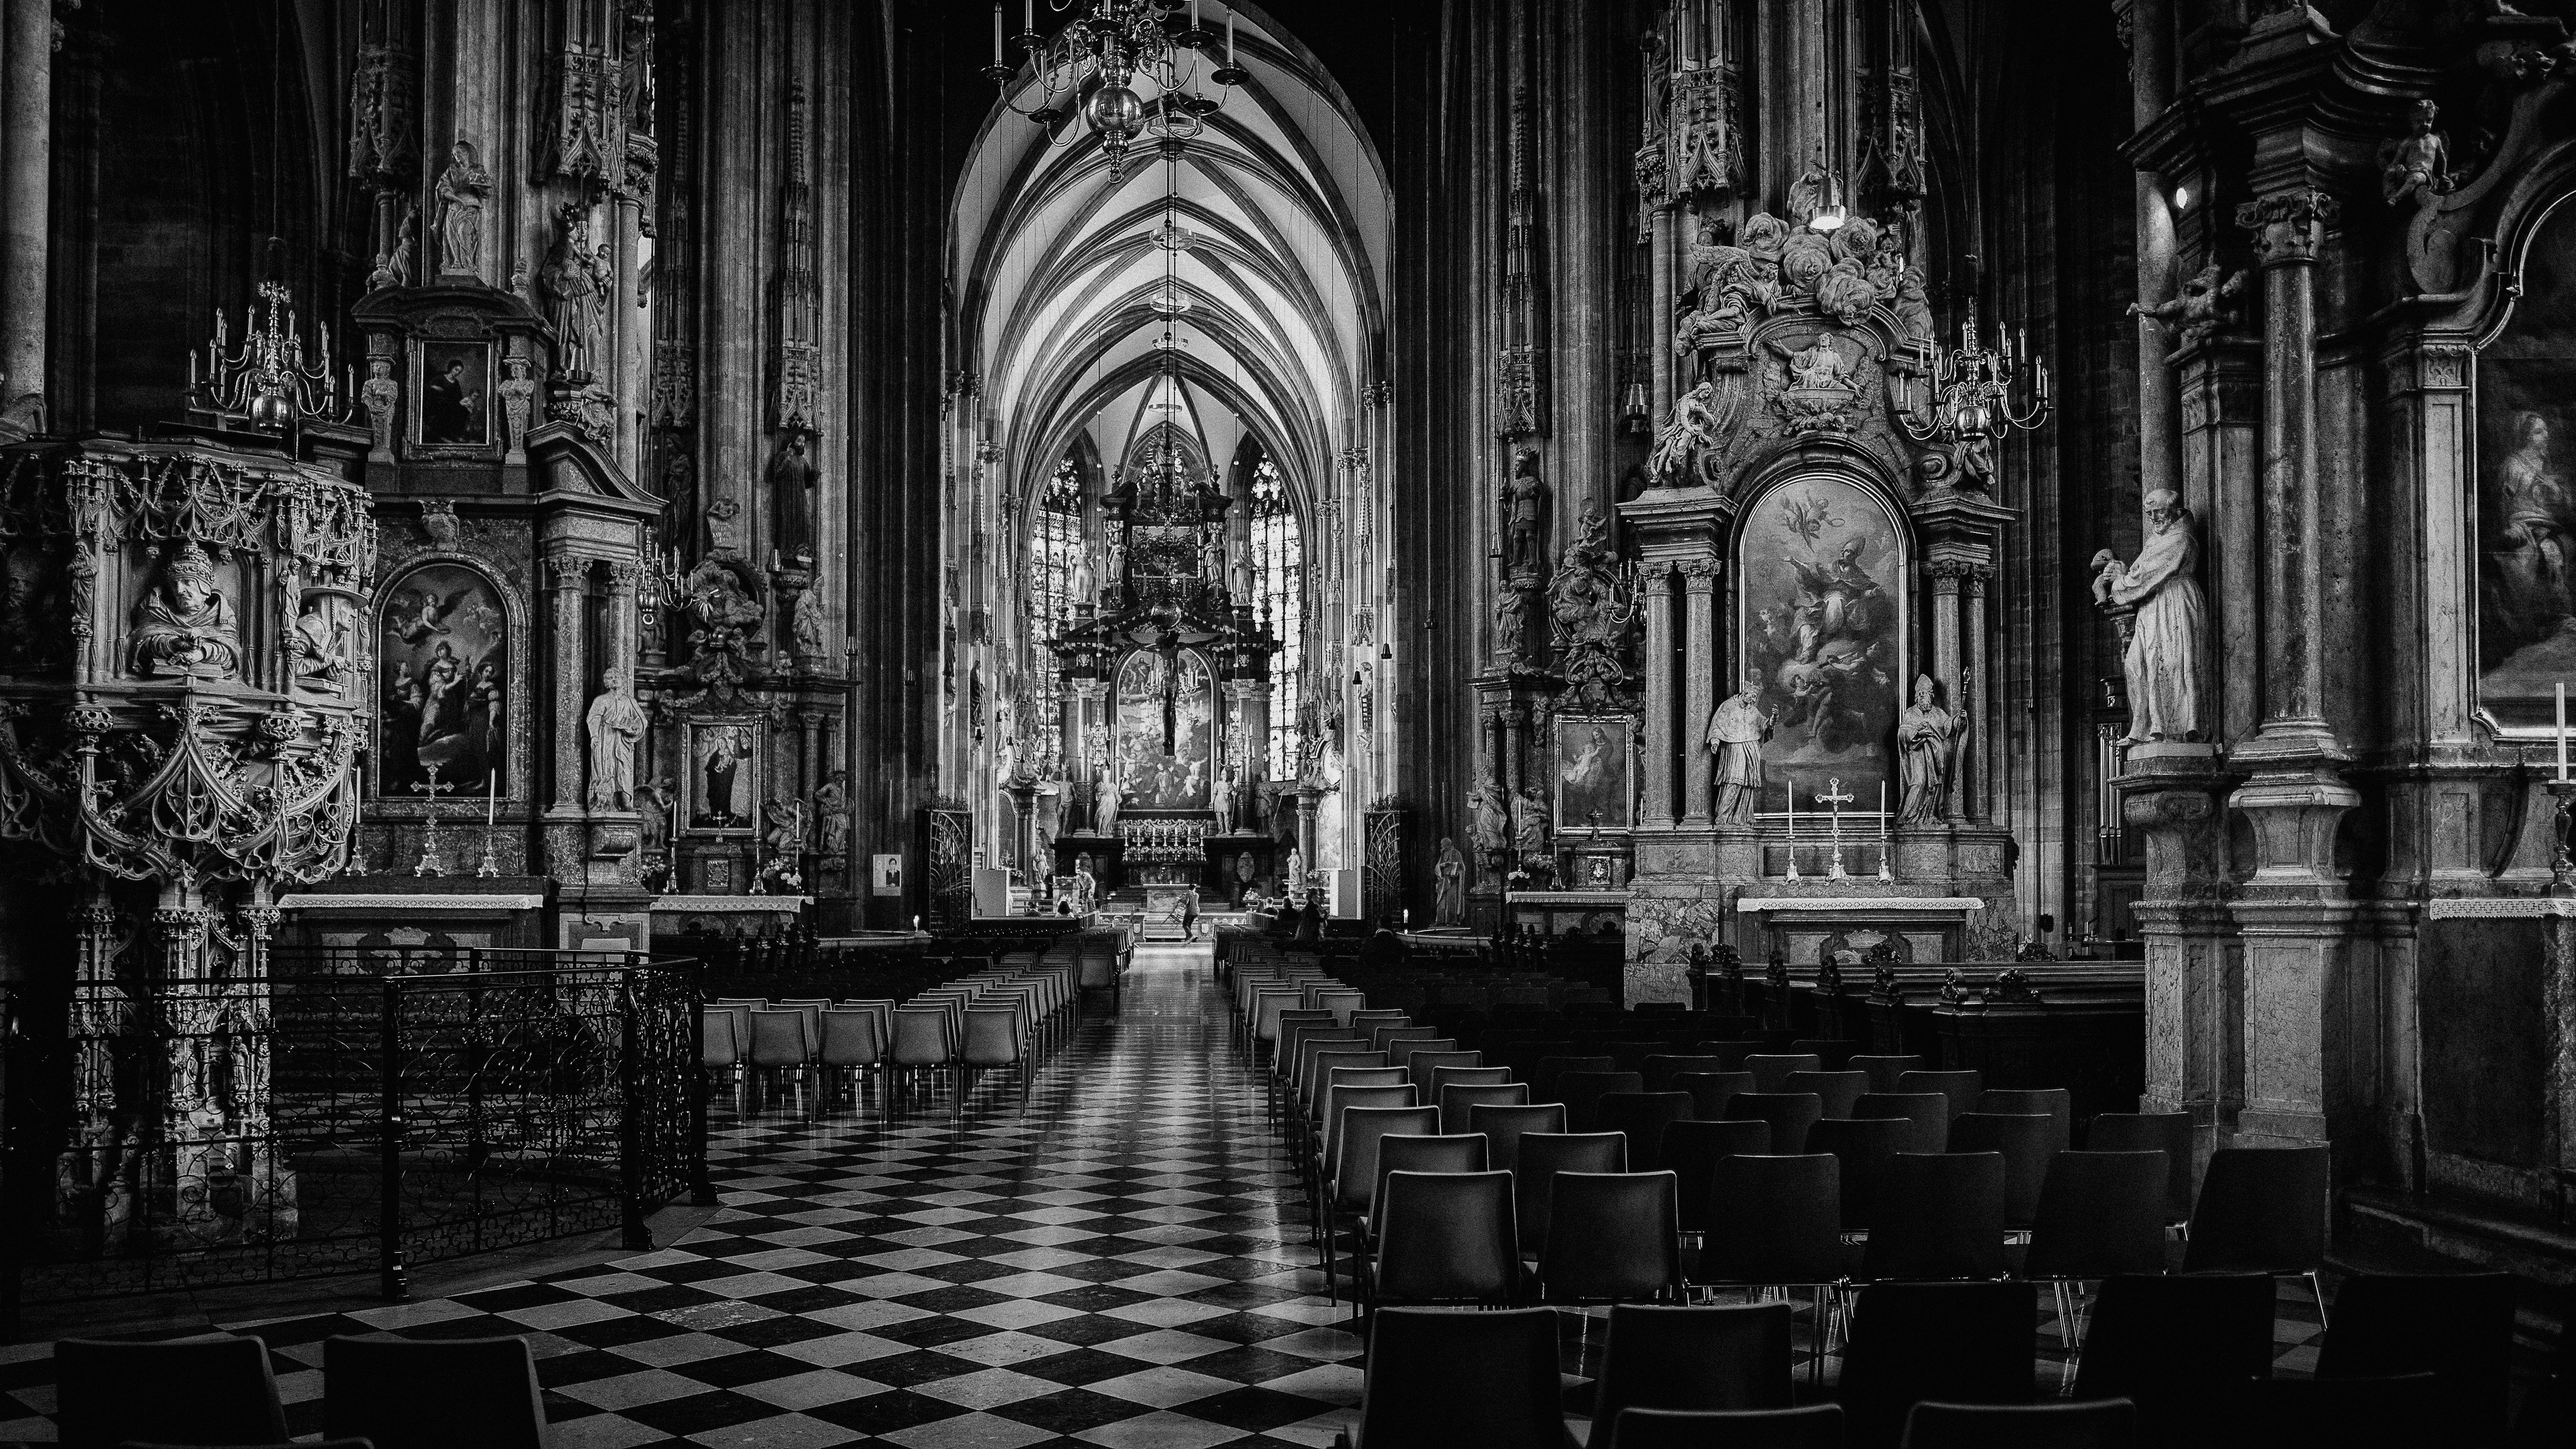 Interior Catedral San Esteban, Viena, Austria, Abril 2018